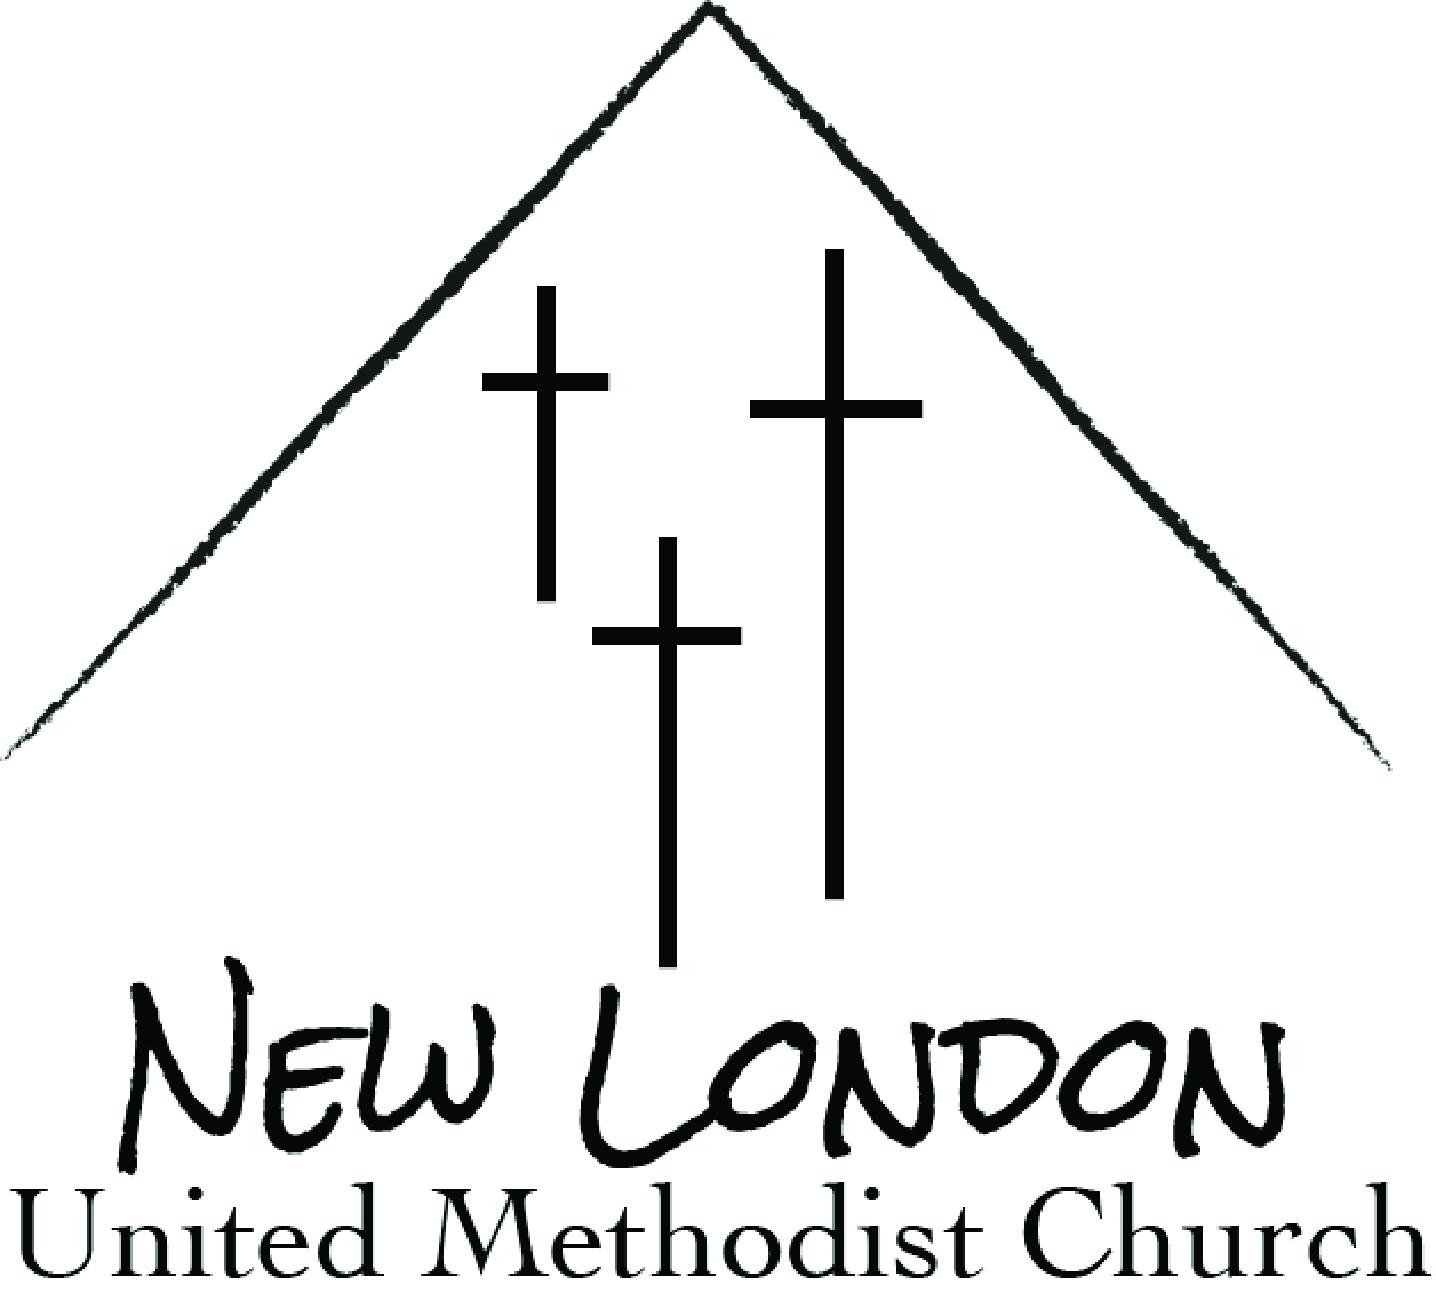 New London United Methodist Church - New London Chamber